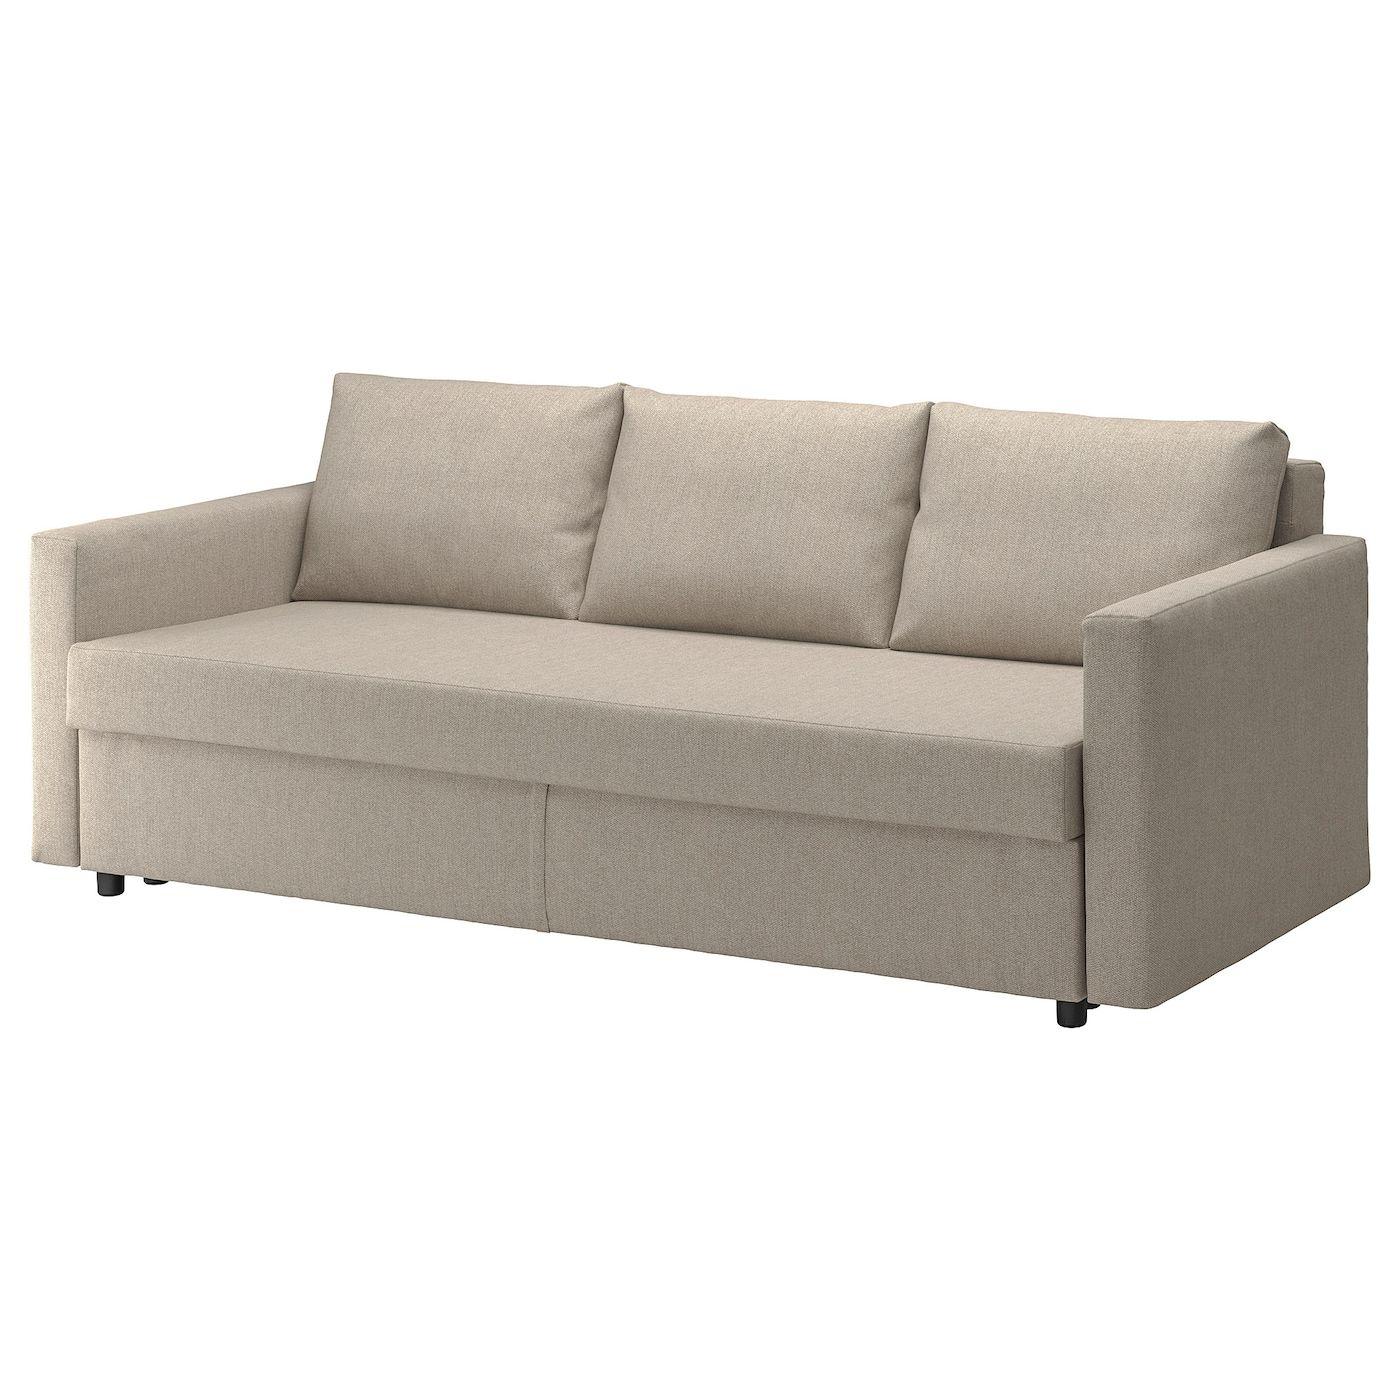 Friheten 3er Bettsofa Hyllie Beige Ikea Deutschland In 2020 Sofa Bed With Storage Ikea Bed Sleeper Sofa